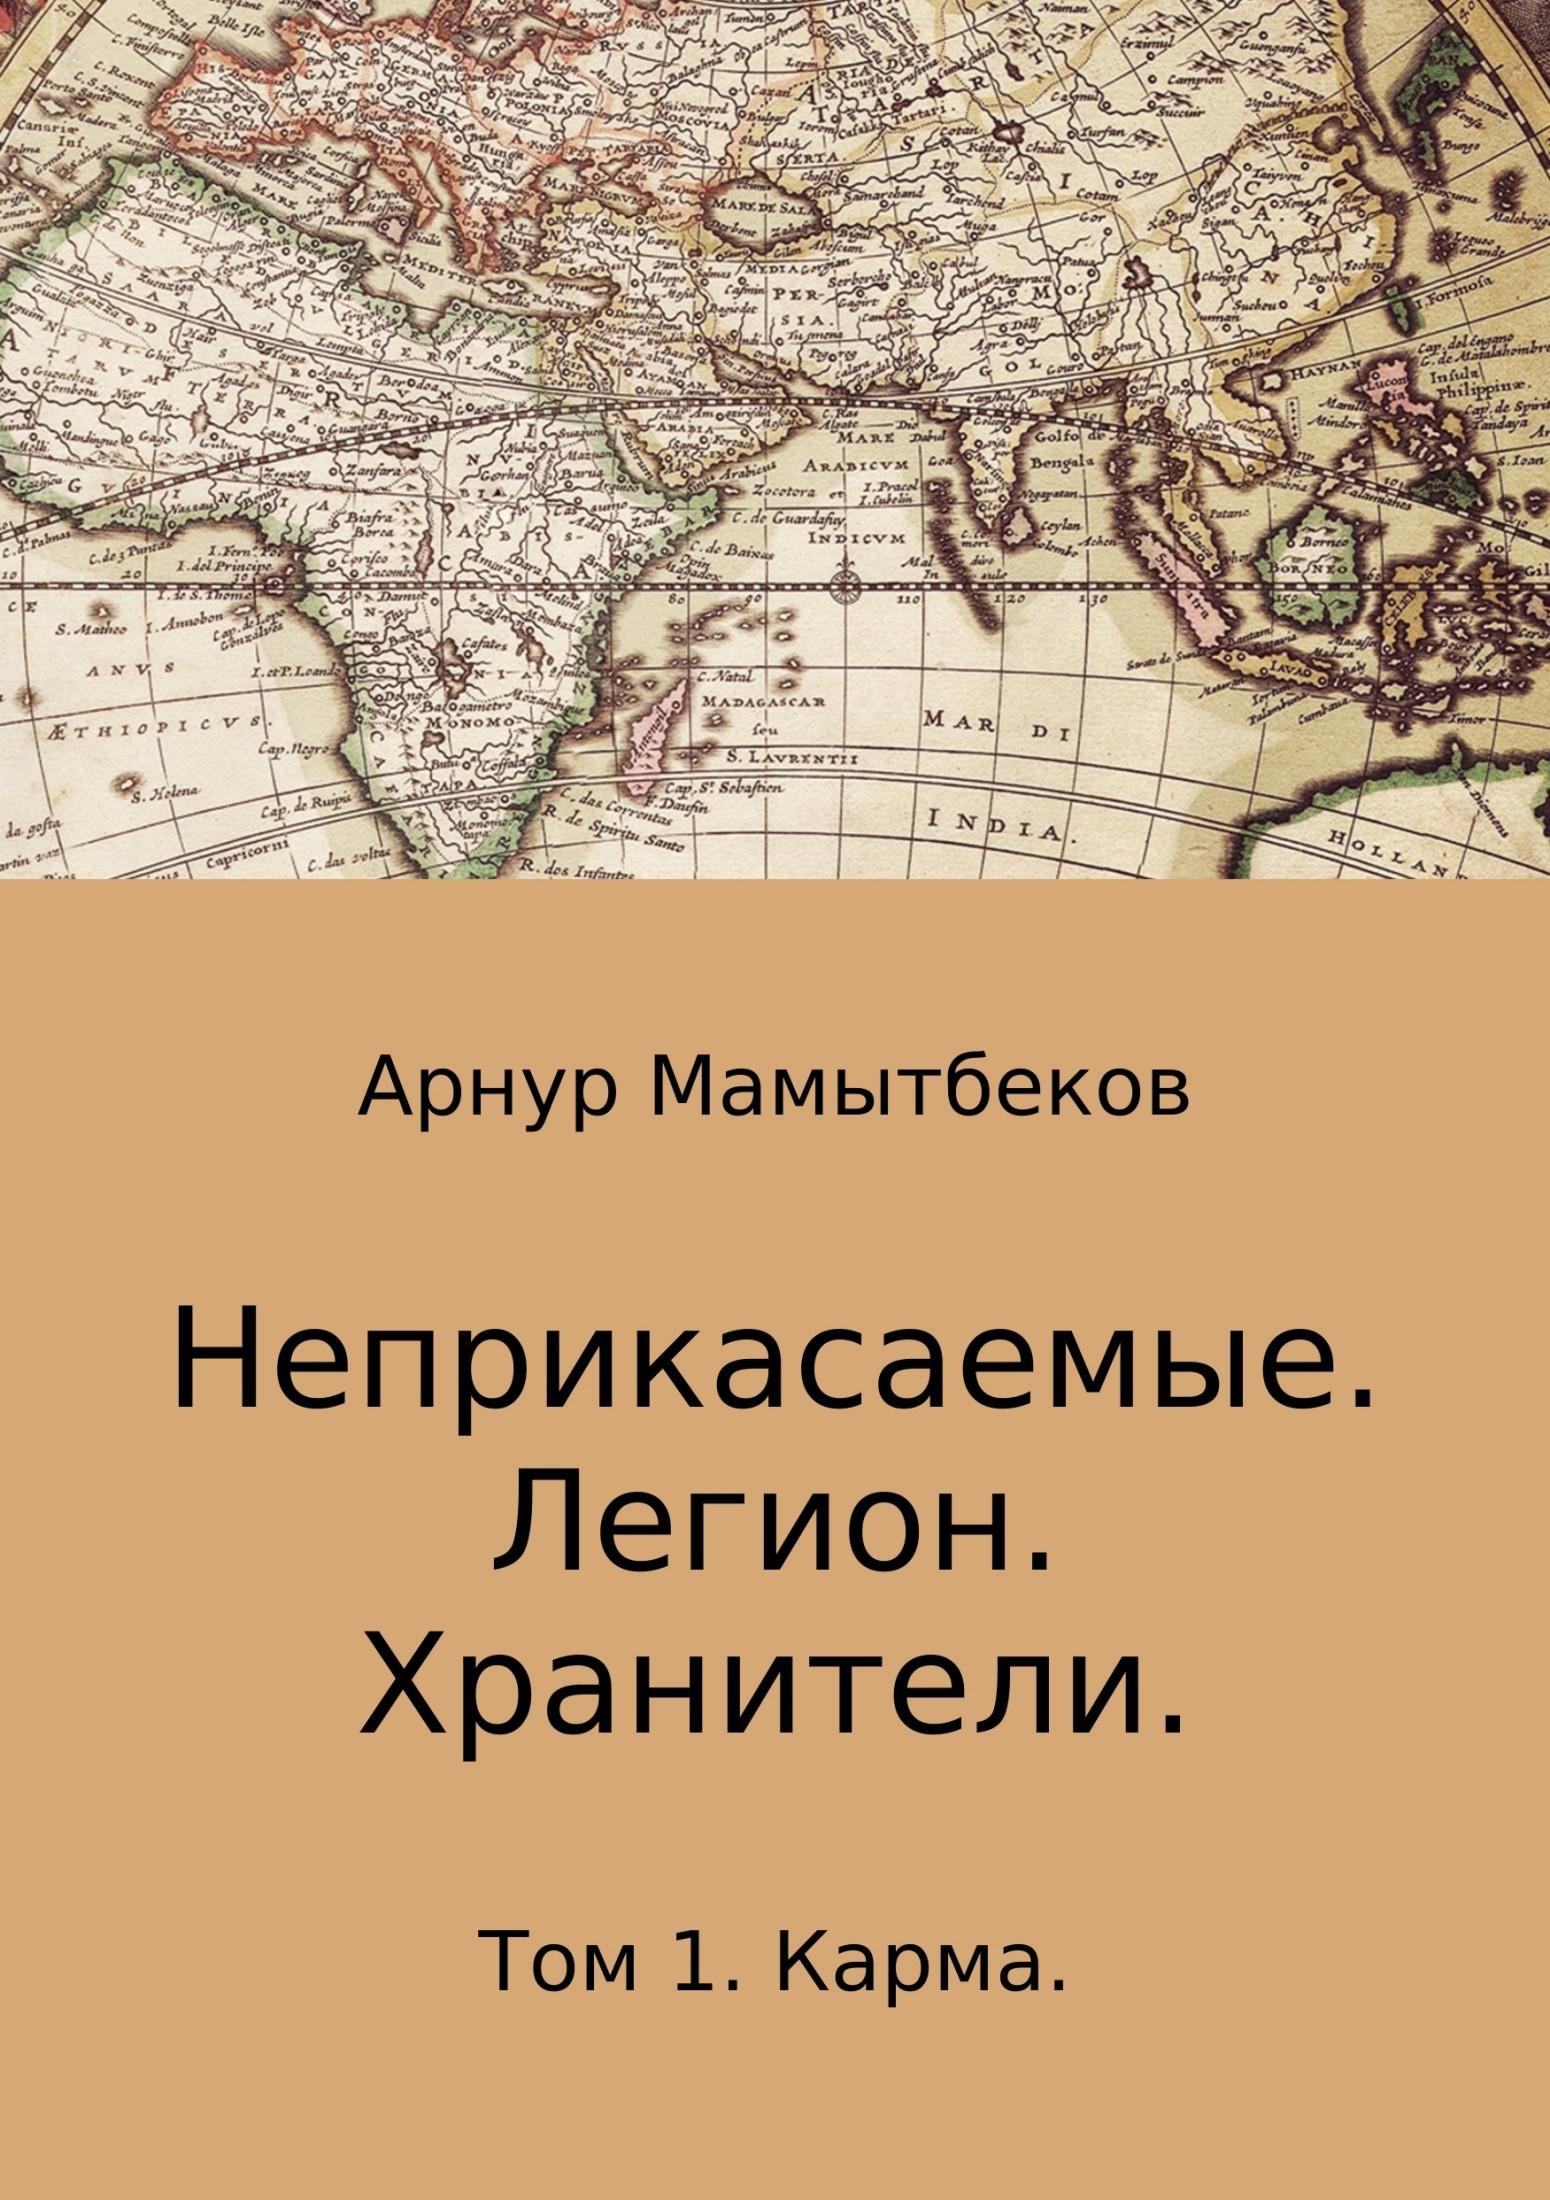 Арнур Бокейханович Мамытбеков бесплатно